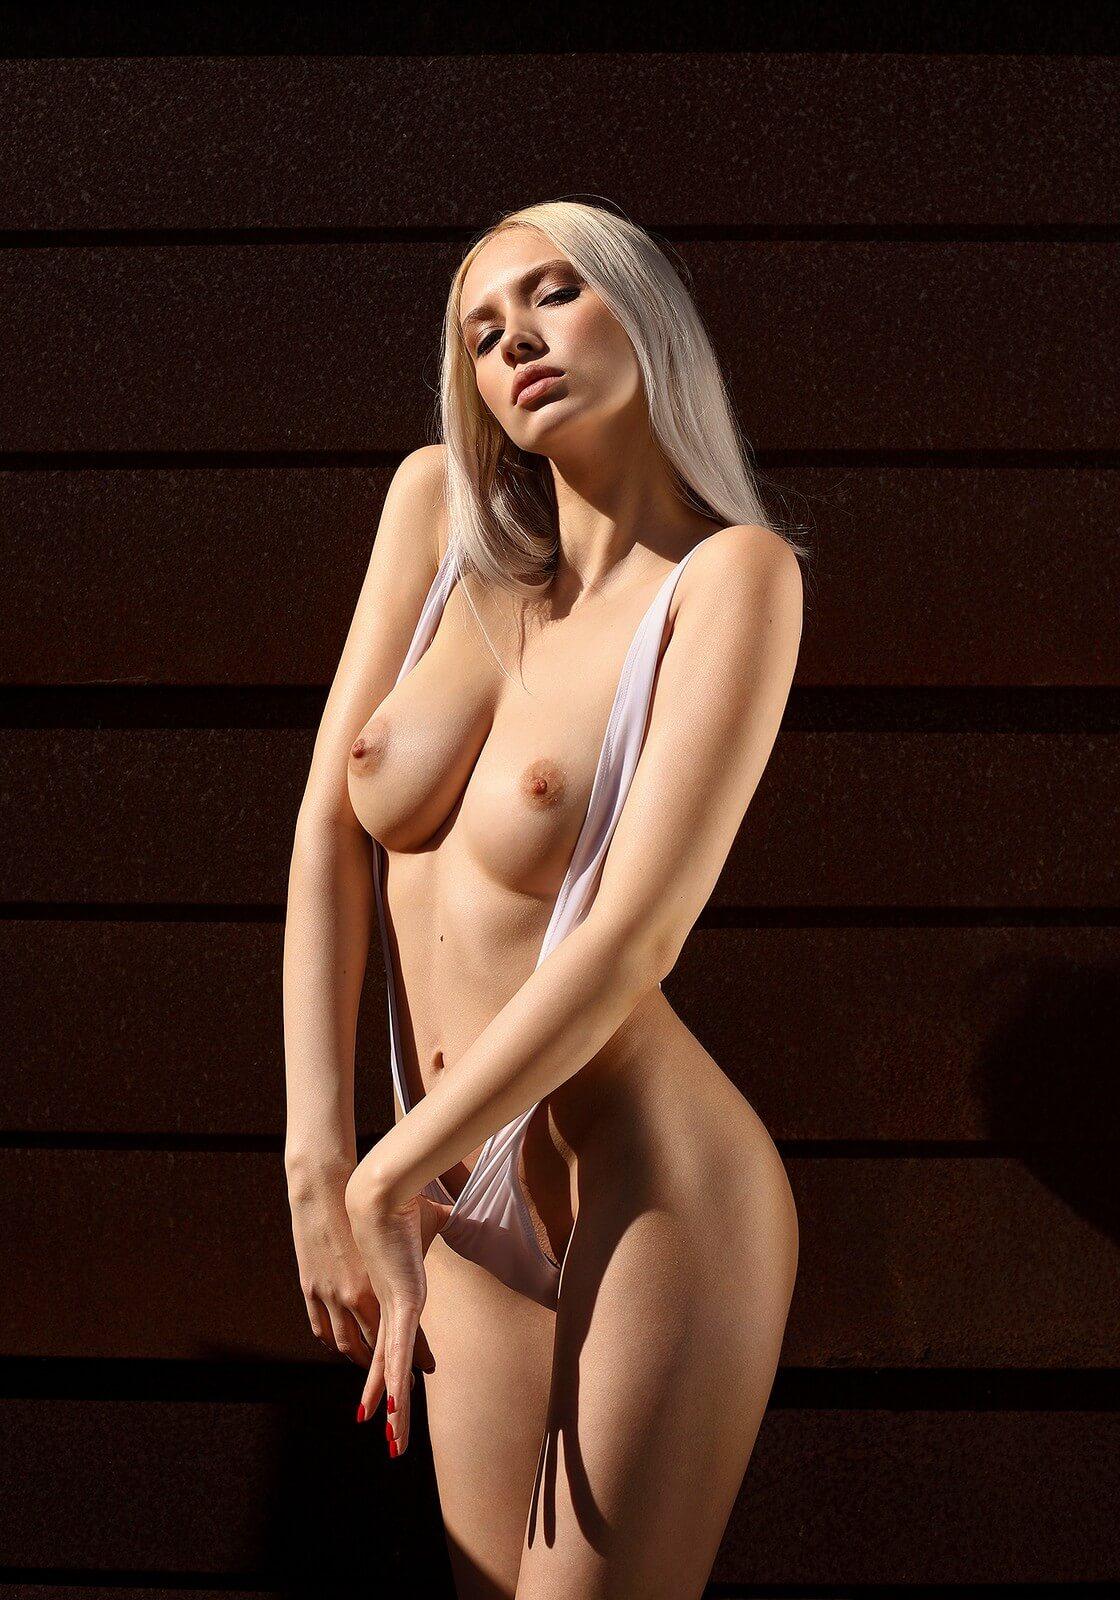 Ana Carolina Playboy monica wasp nudeana dias for playboy ⋆ pandesia world